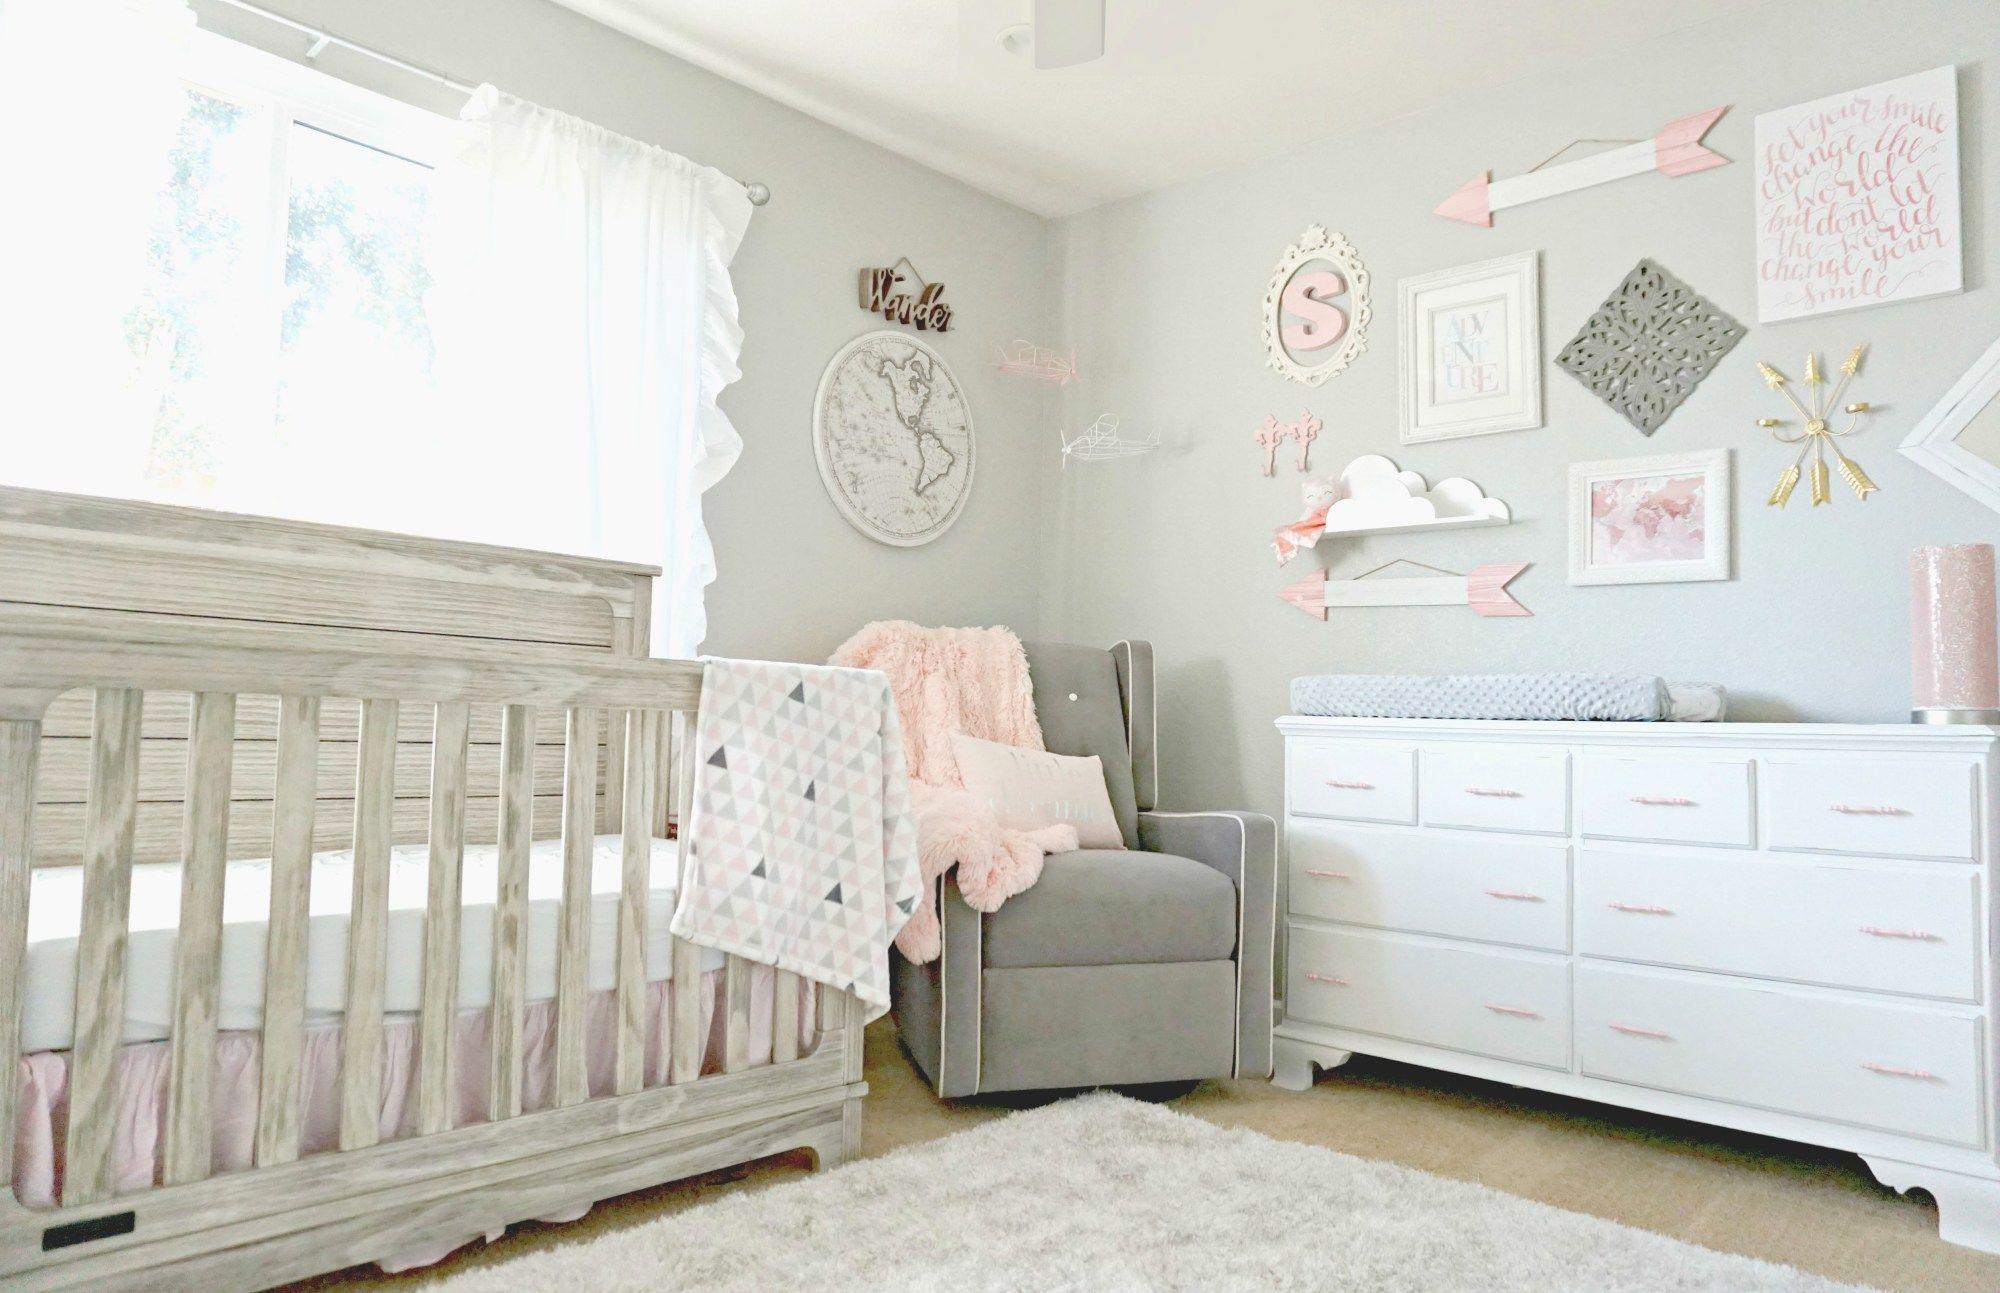 Adventure Travel Theme Nursery Baby Girl Room Decor Baby Girl Room Nursery Themes